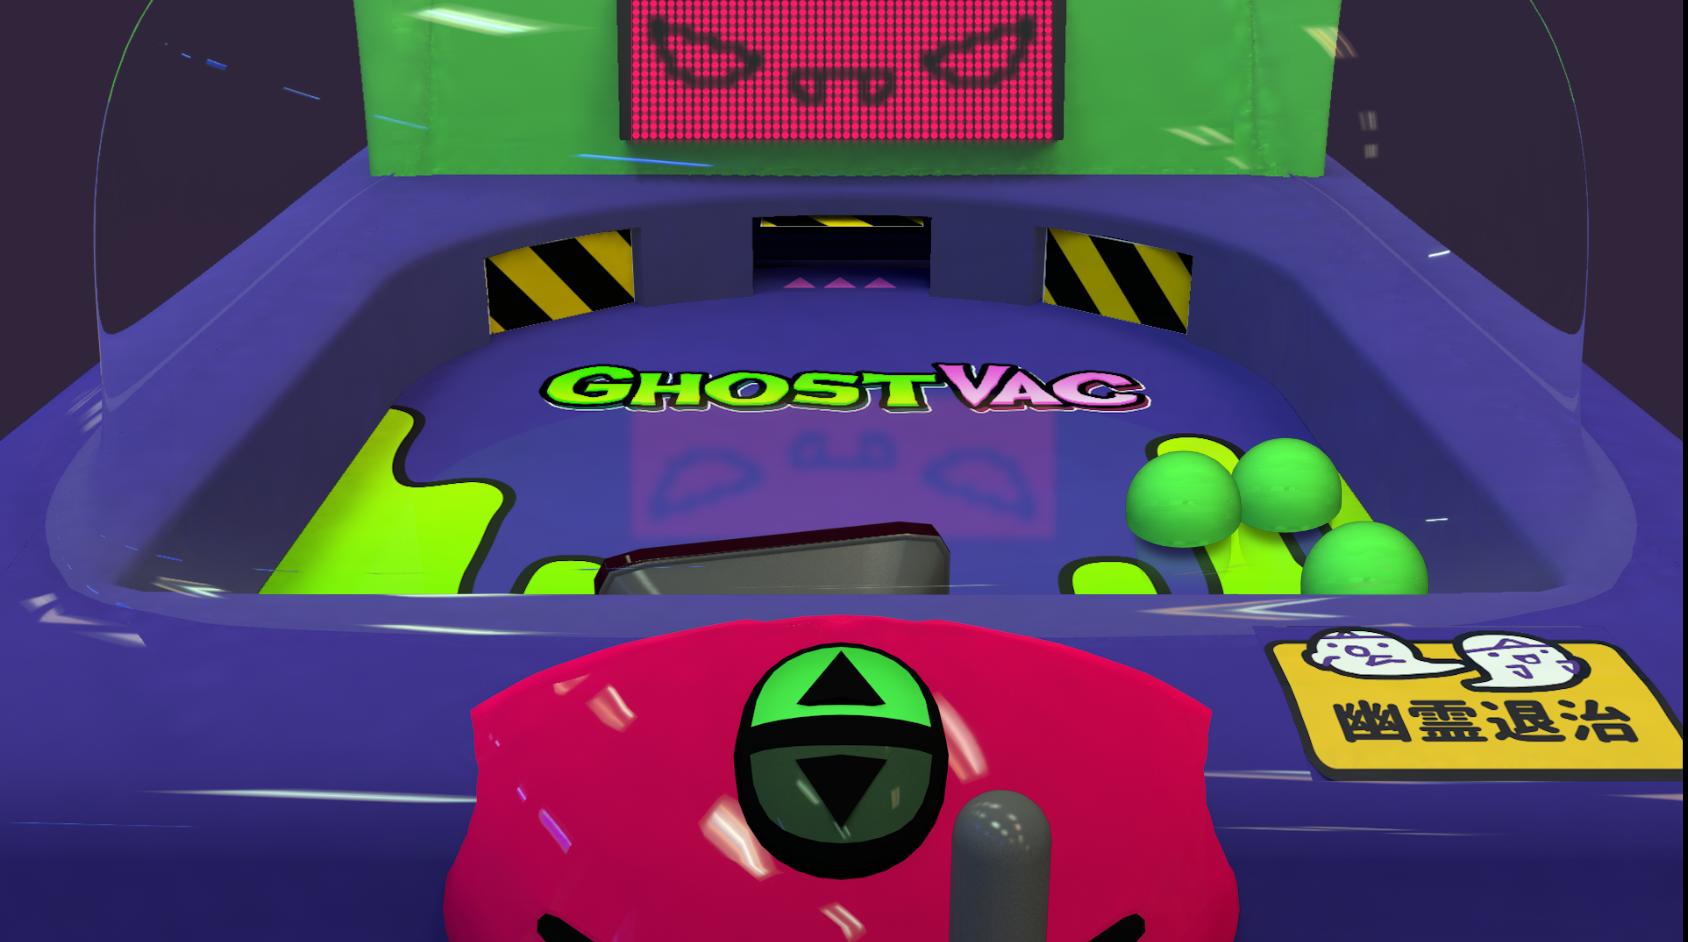 GhostVac